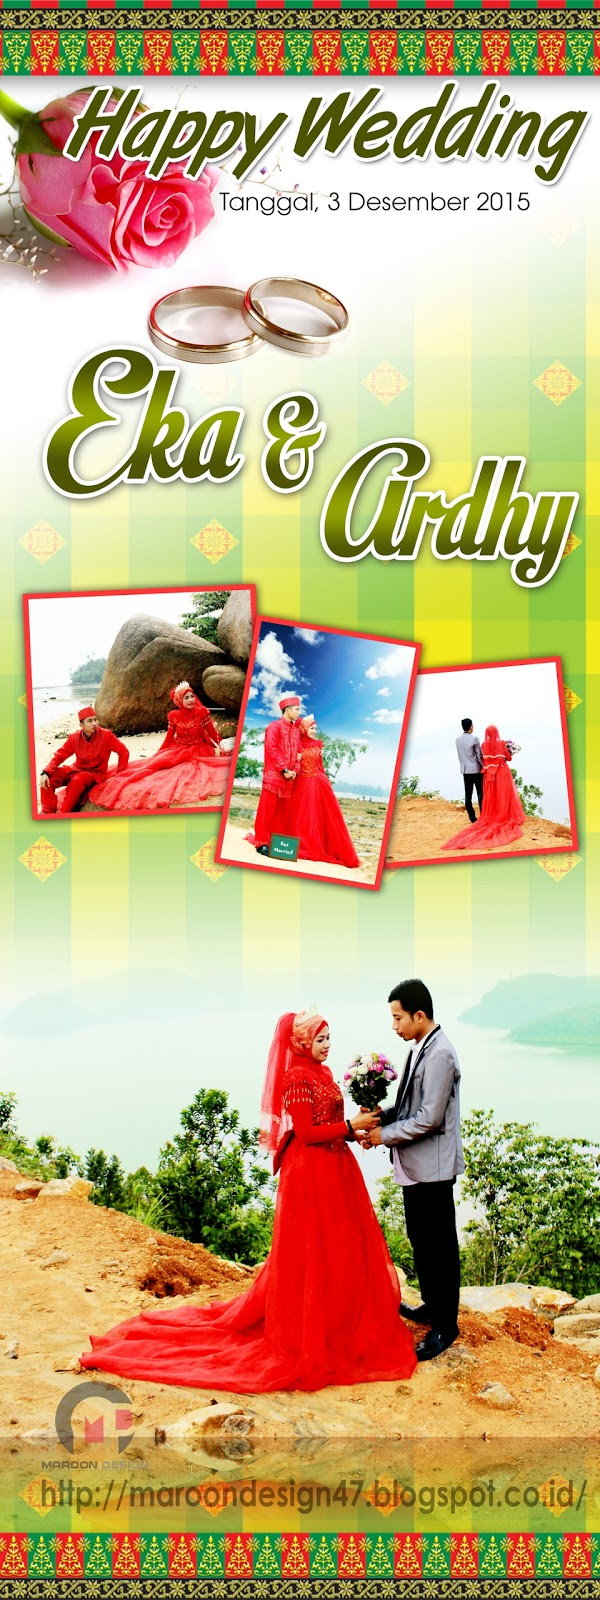 Design x banner pernikahan - Desain X Banner Wedding Psd